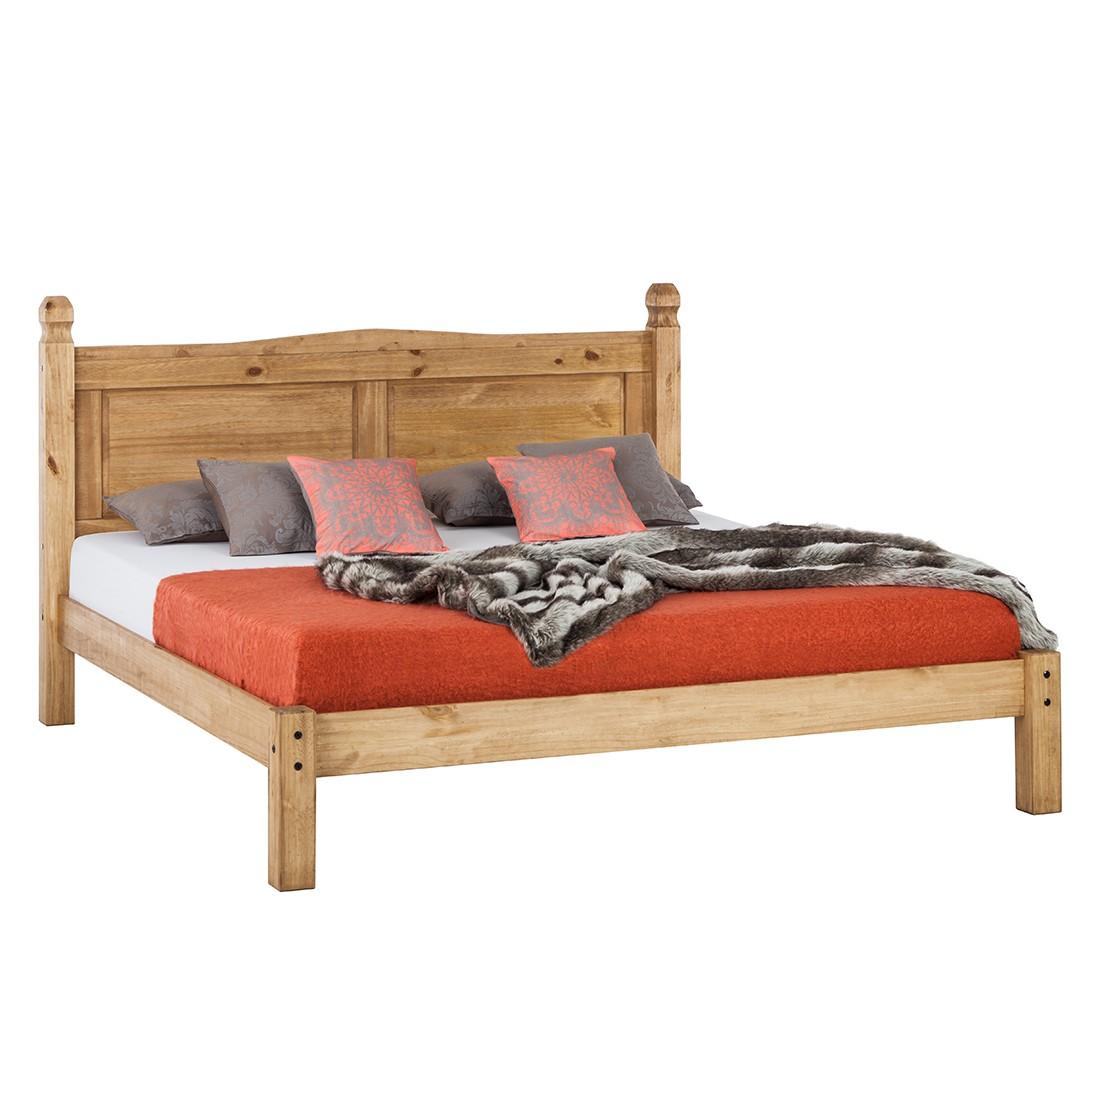 Lit en futon Finca Rustica - Pin massif - Ciré - 140 cm x 200 cm, Landhaus Classic